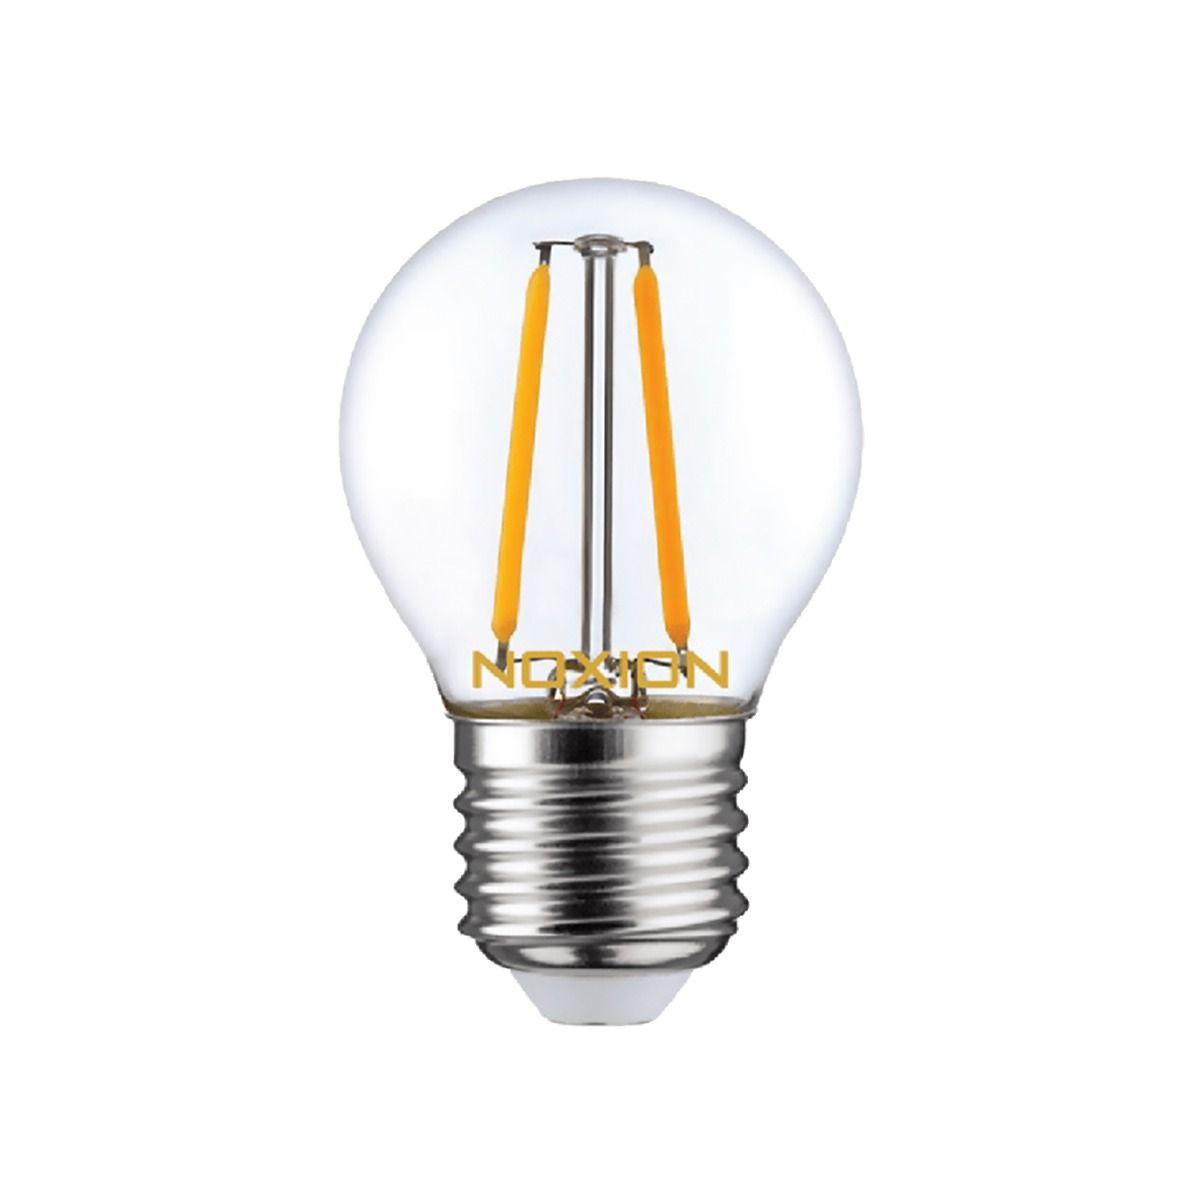 Noxion Lucent LED Lustre E27 2.6W 827 Filament | Extra Warm White - Replaces 25W